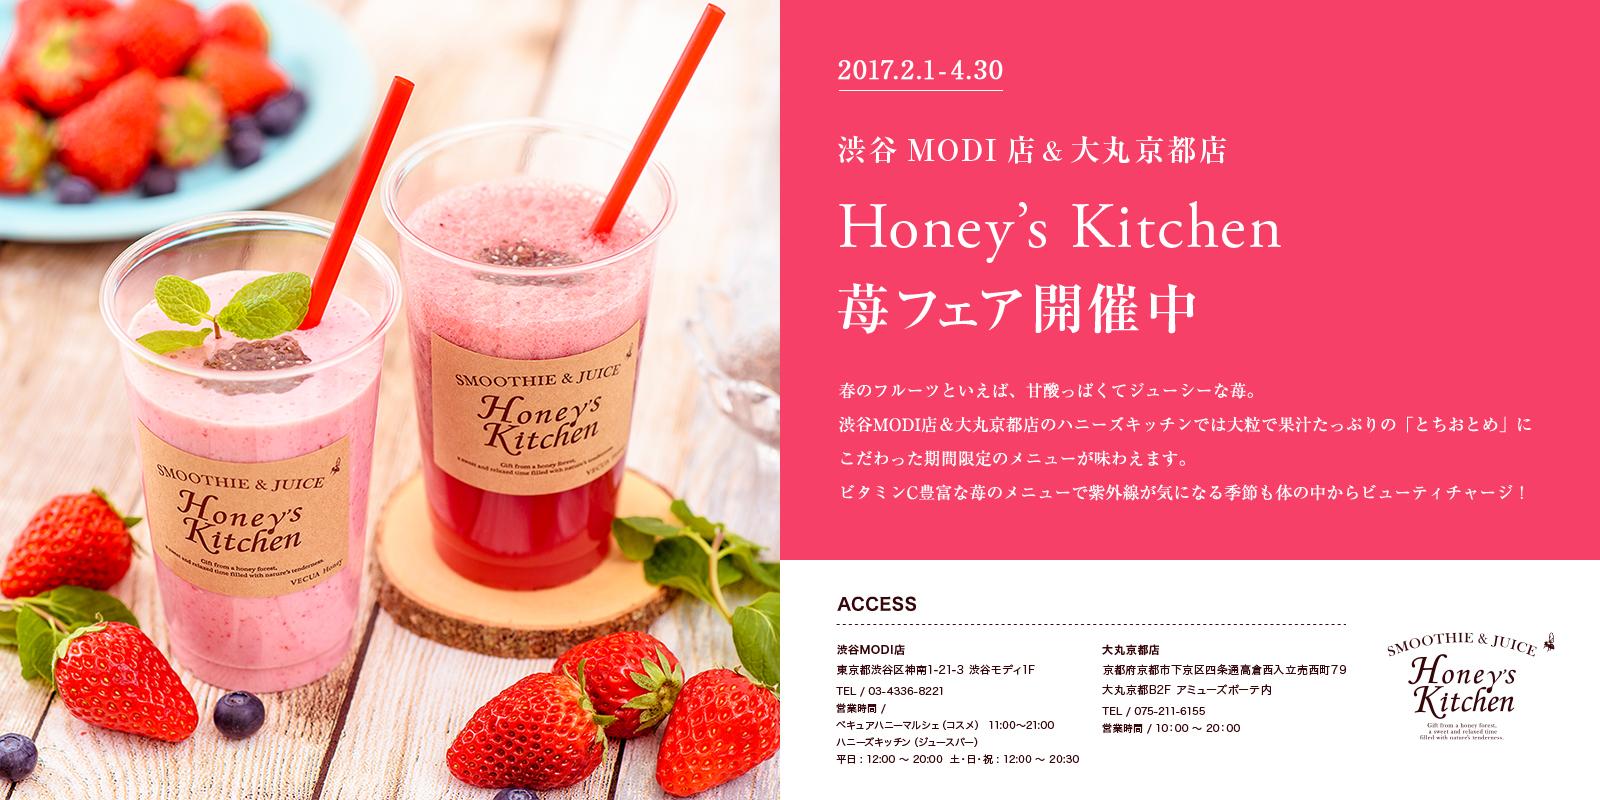 2017.2.1 – 4.30 渋谷MODI店&京都大丸店 Honey's Kitchen 苺フェア開催中